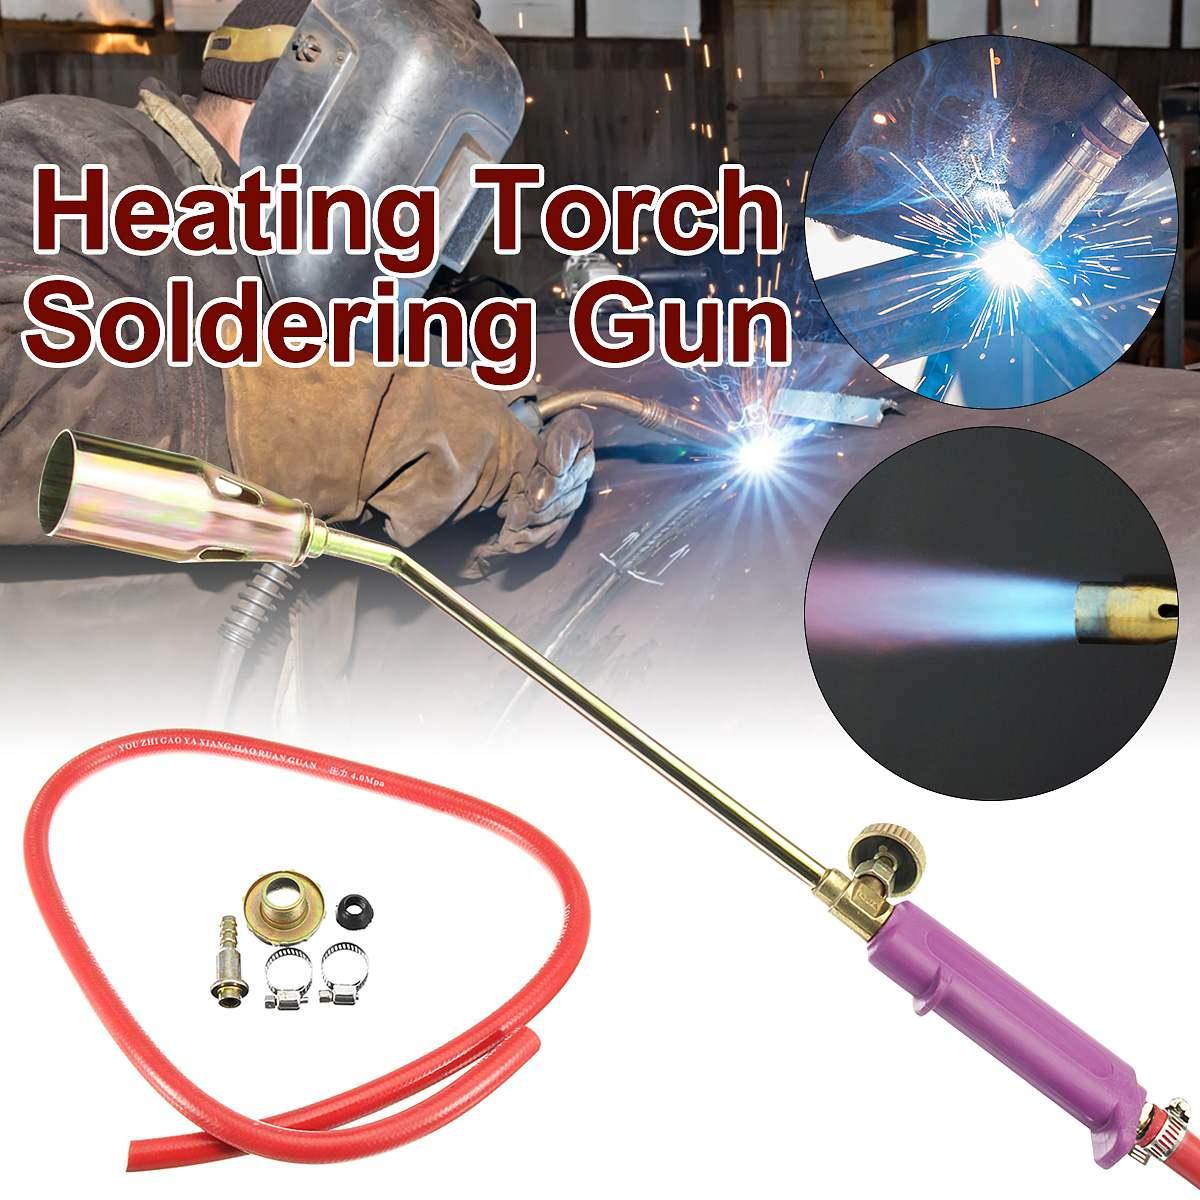 New Heating Torch Soldering Gu N Propane Gas Blowing